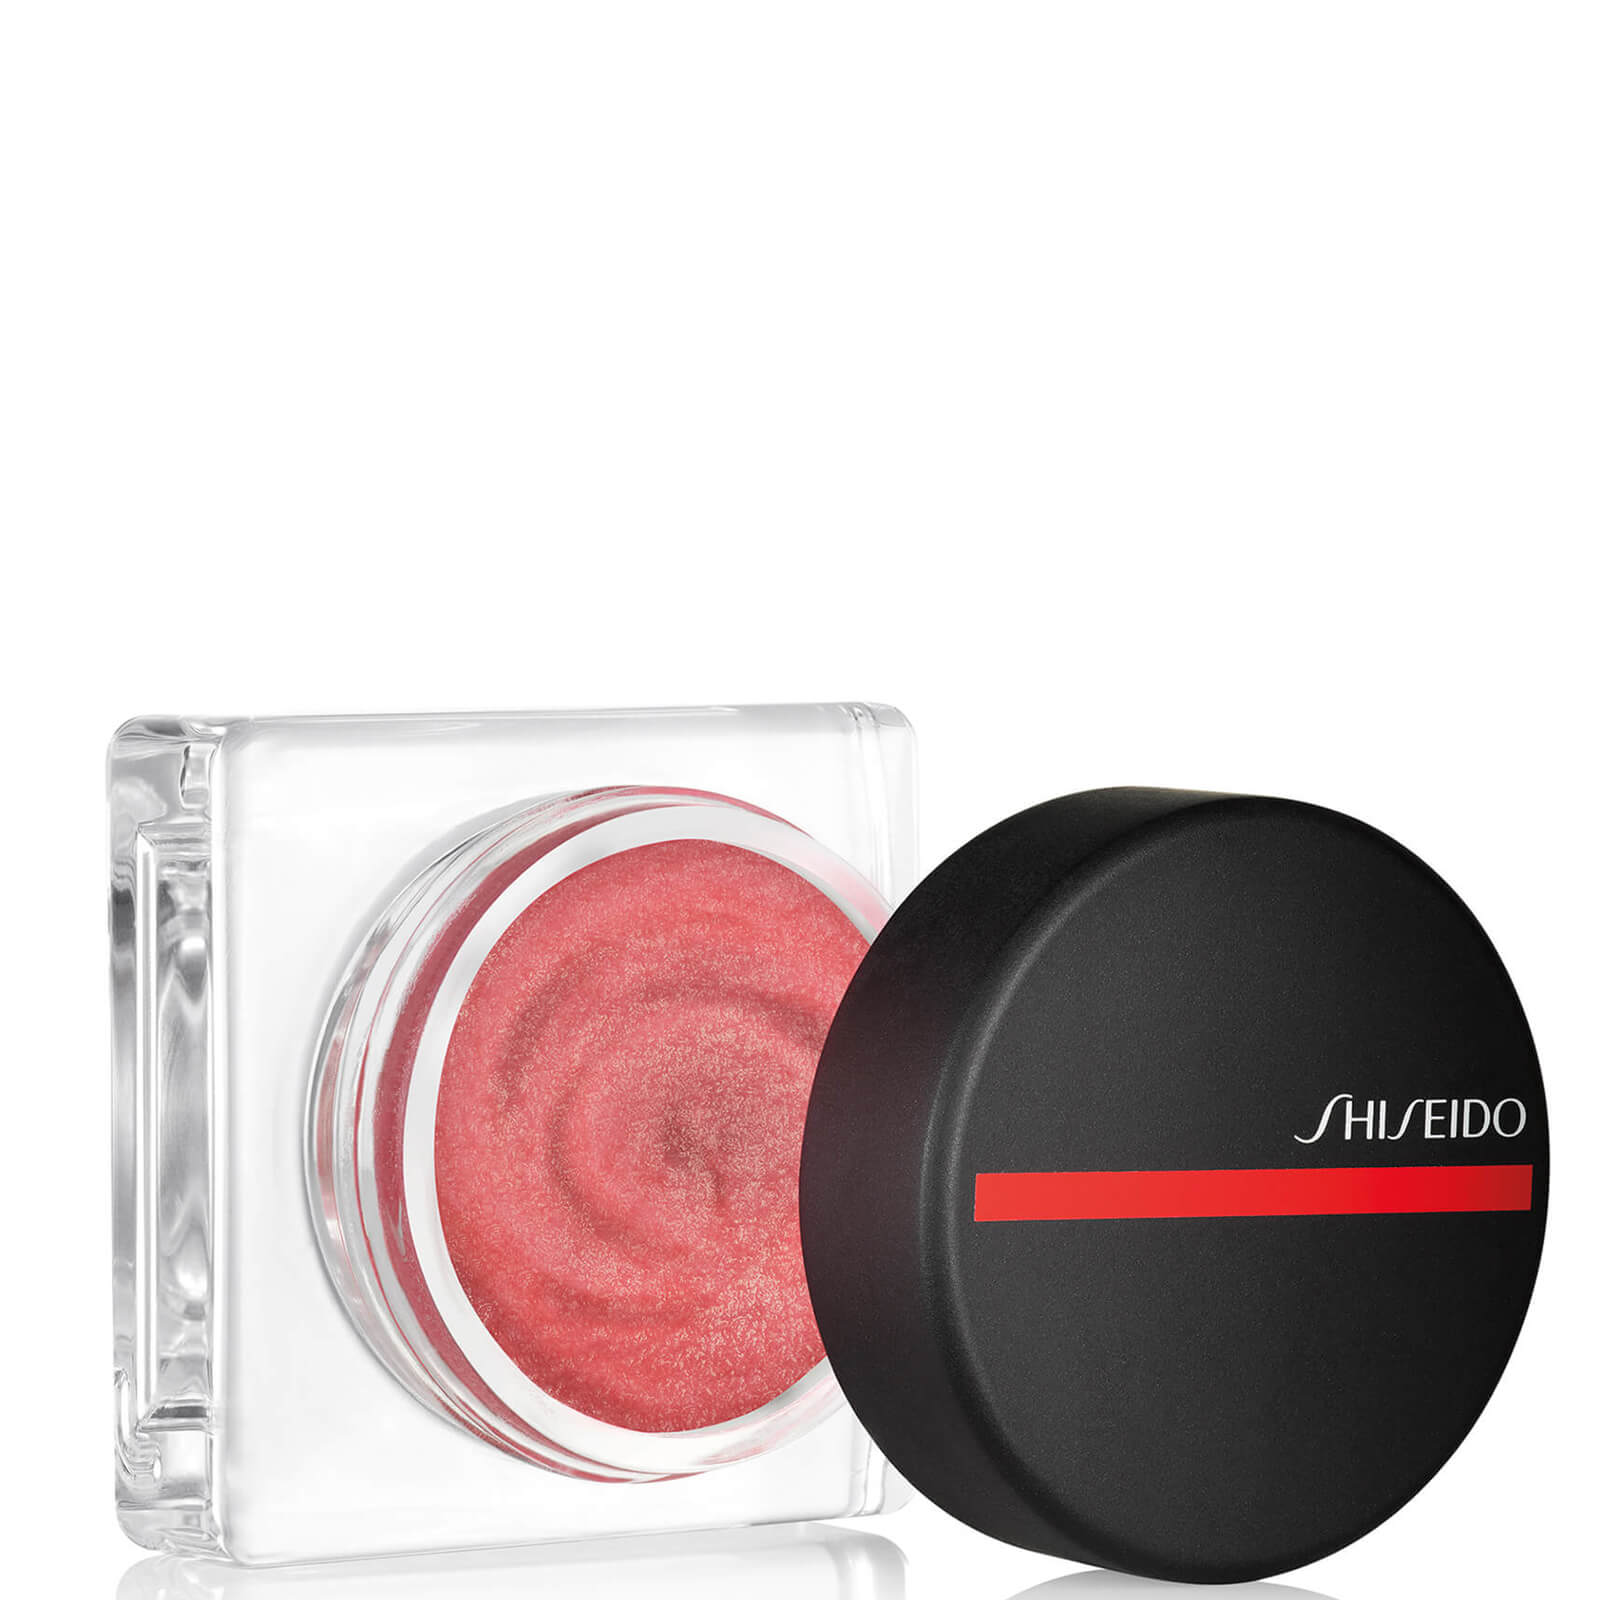 Купить Румяна-вуаль Shiseido Minimalist Whipped Powder Blush (различные оттенки) - Blush Setsuko 07